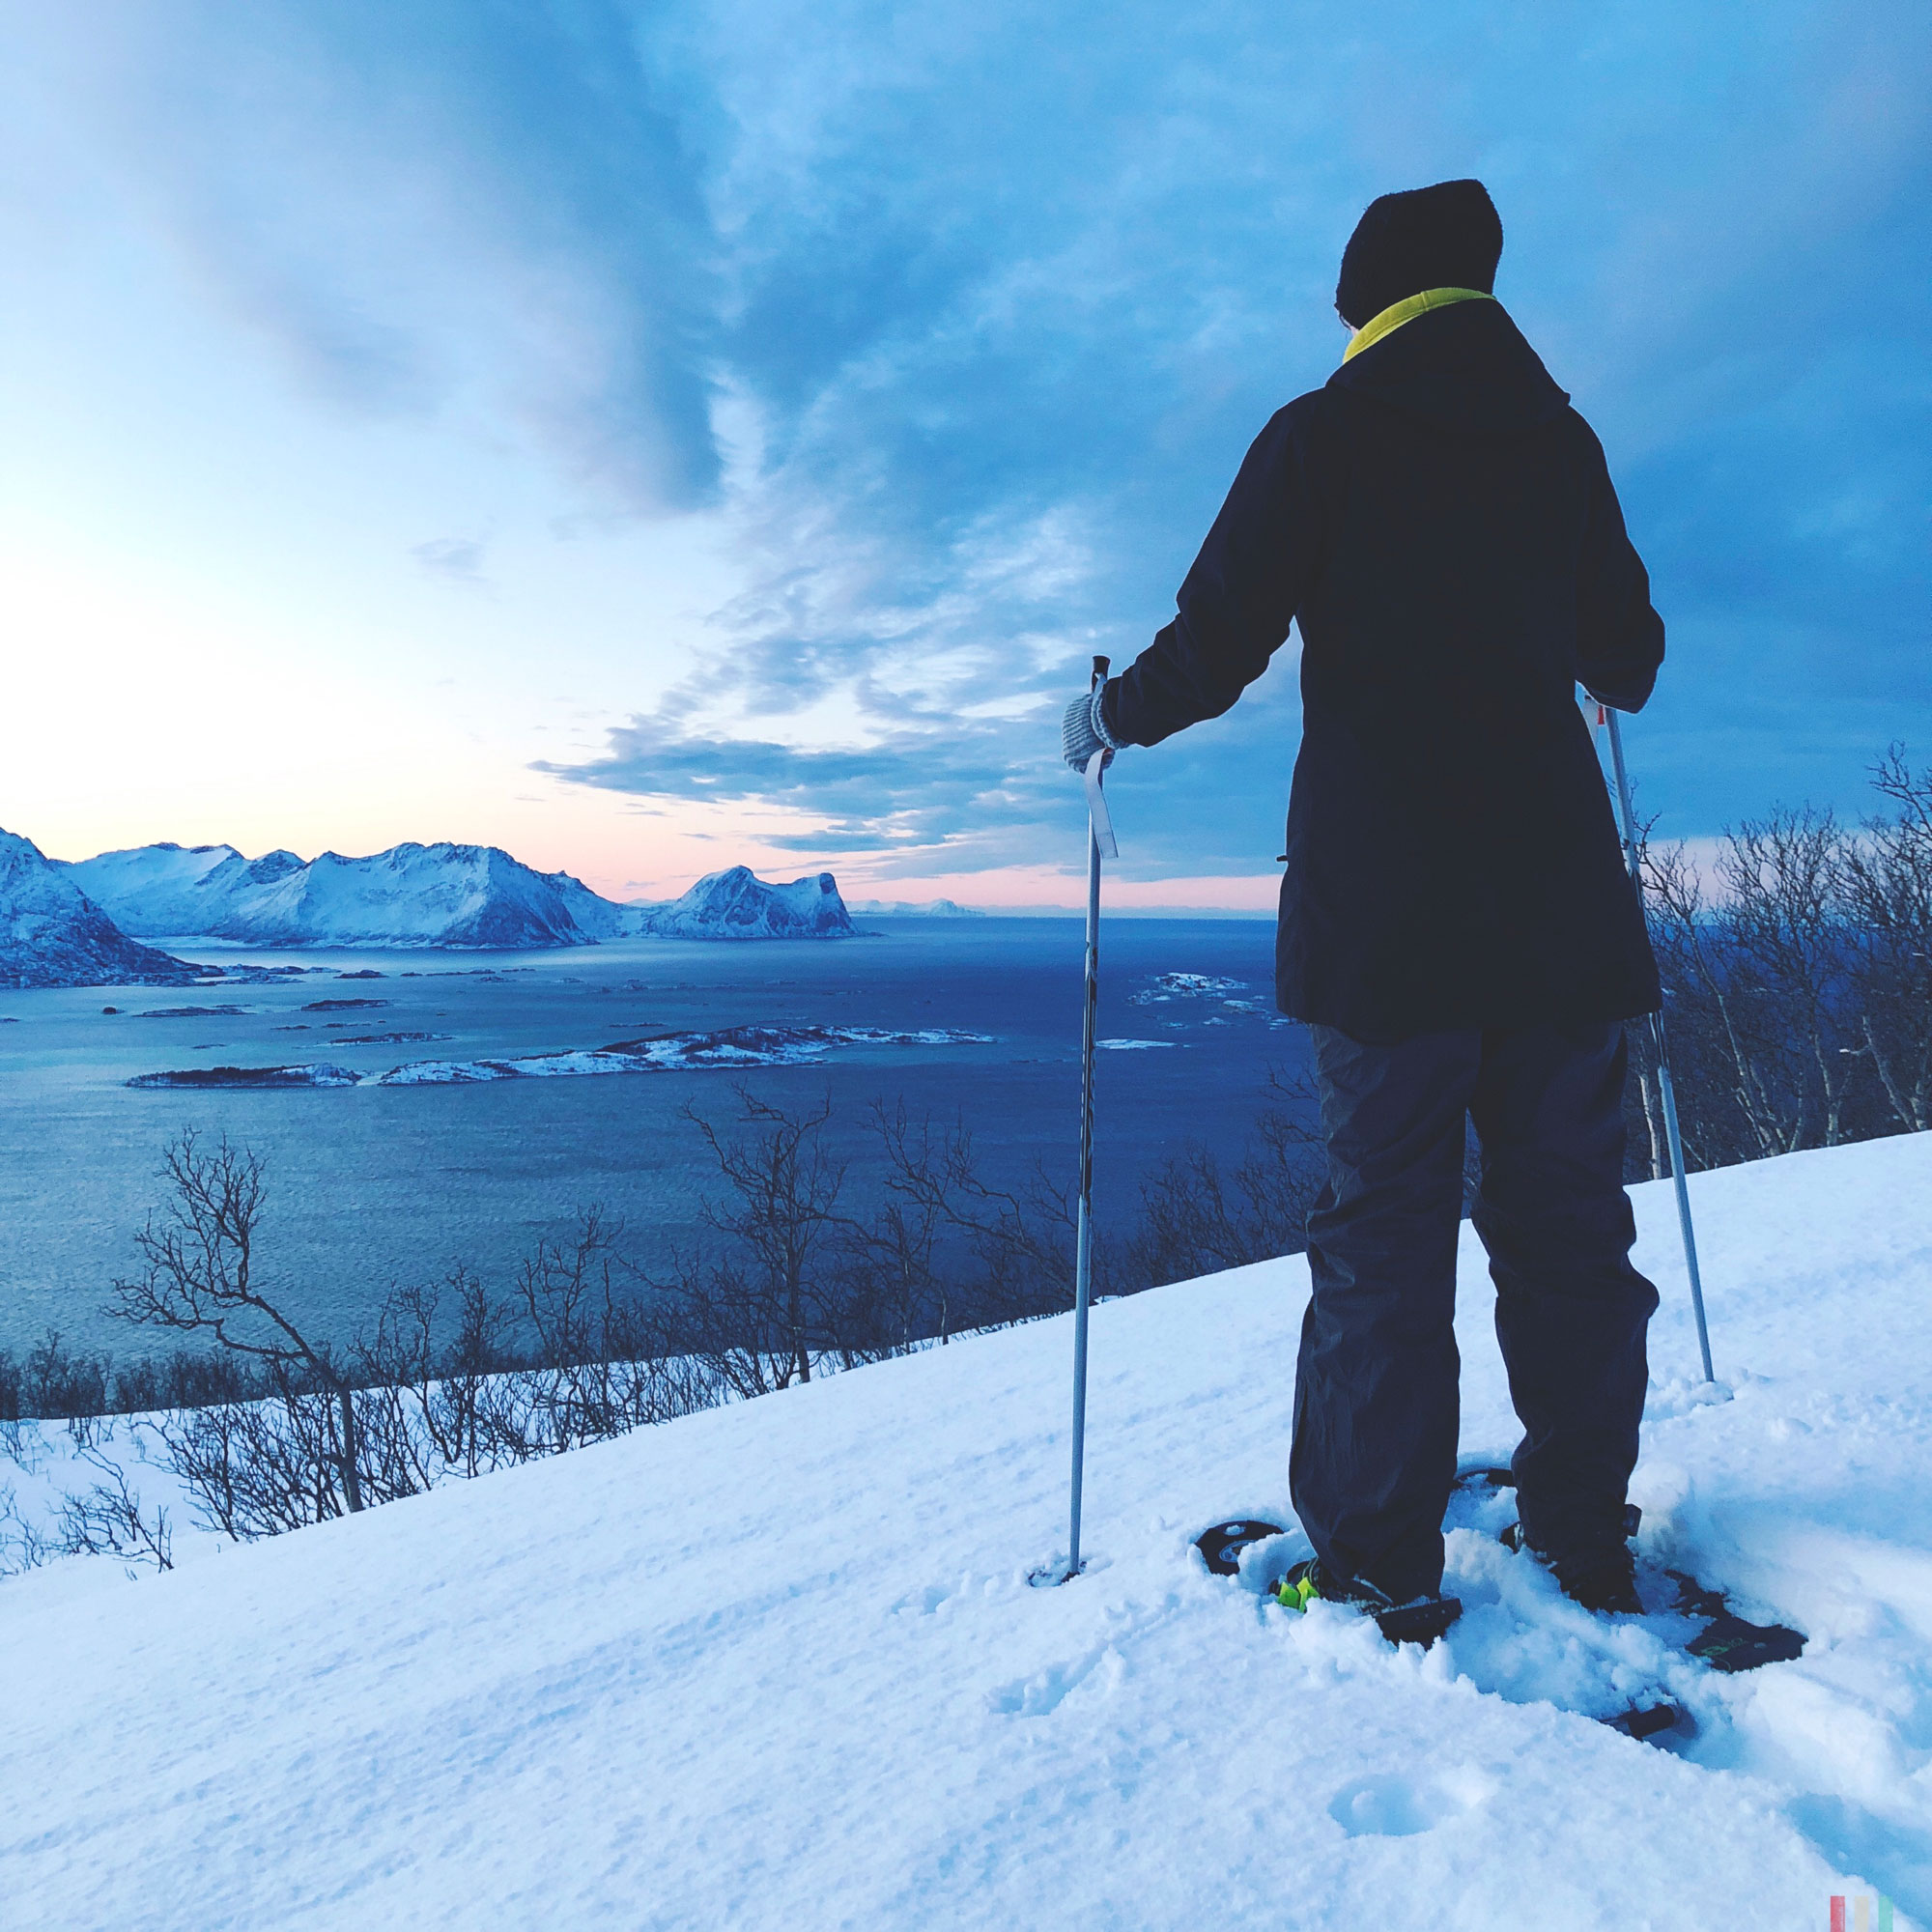 norwegen-senja-wandern-theresa-bergsfjord.jpg